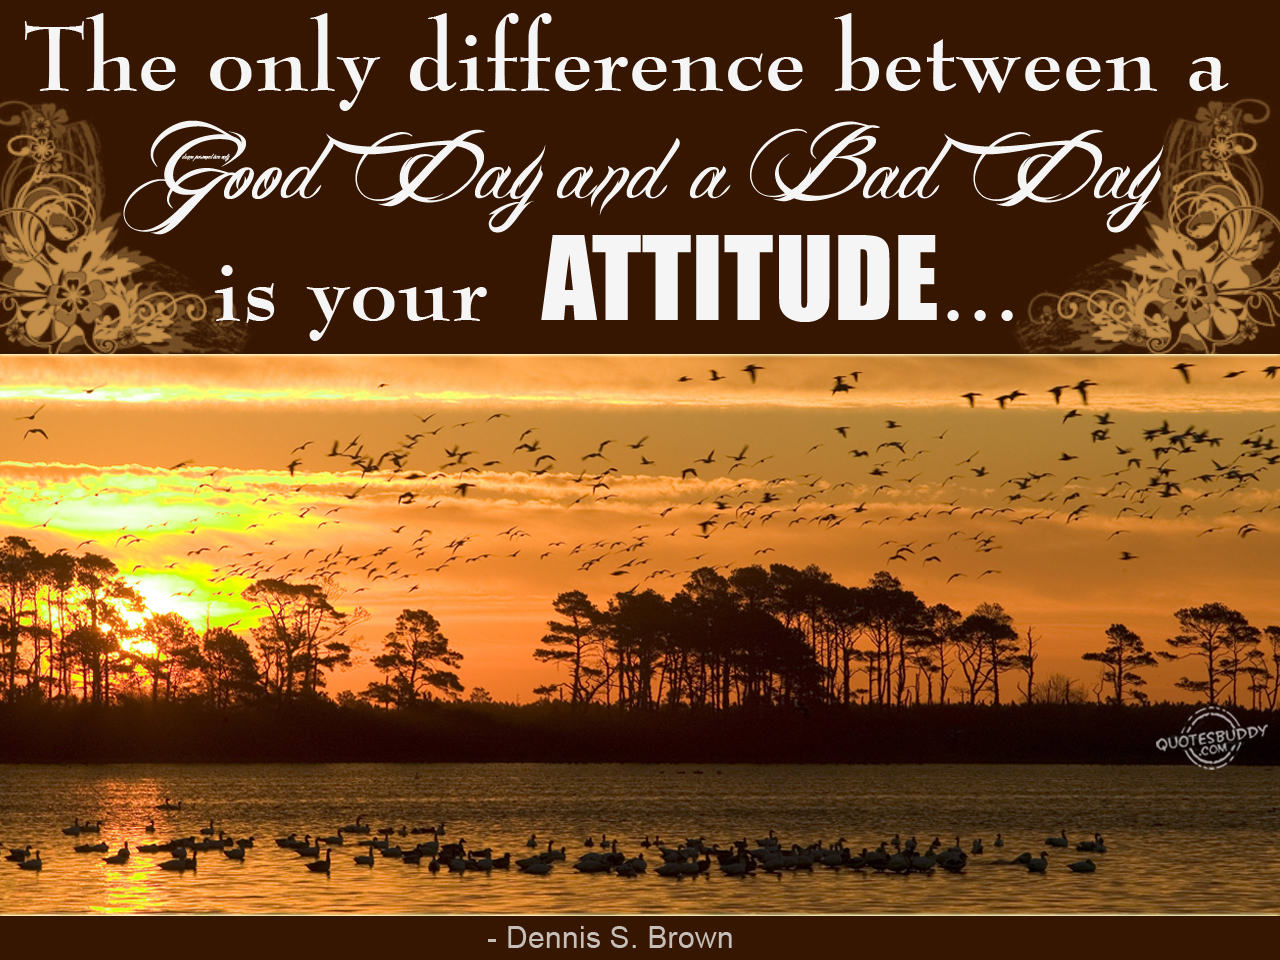 Positive Attitude Quotes: Muhammad Nouman Ali Sheroz Awais Iqbal Talha Mohsin Riaz